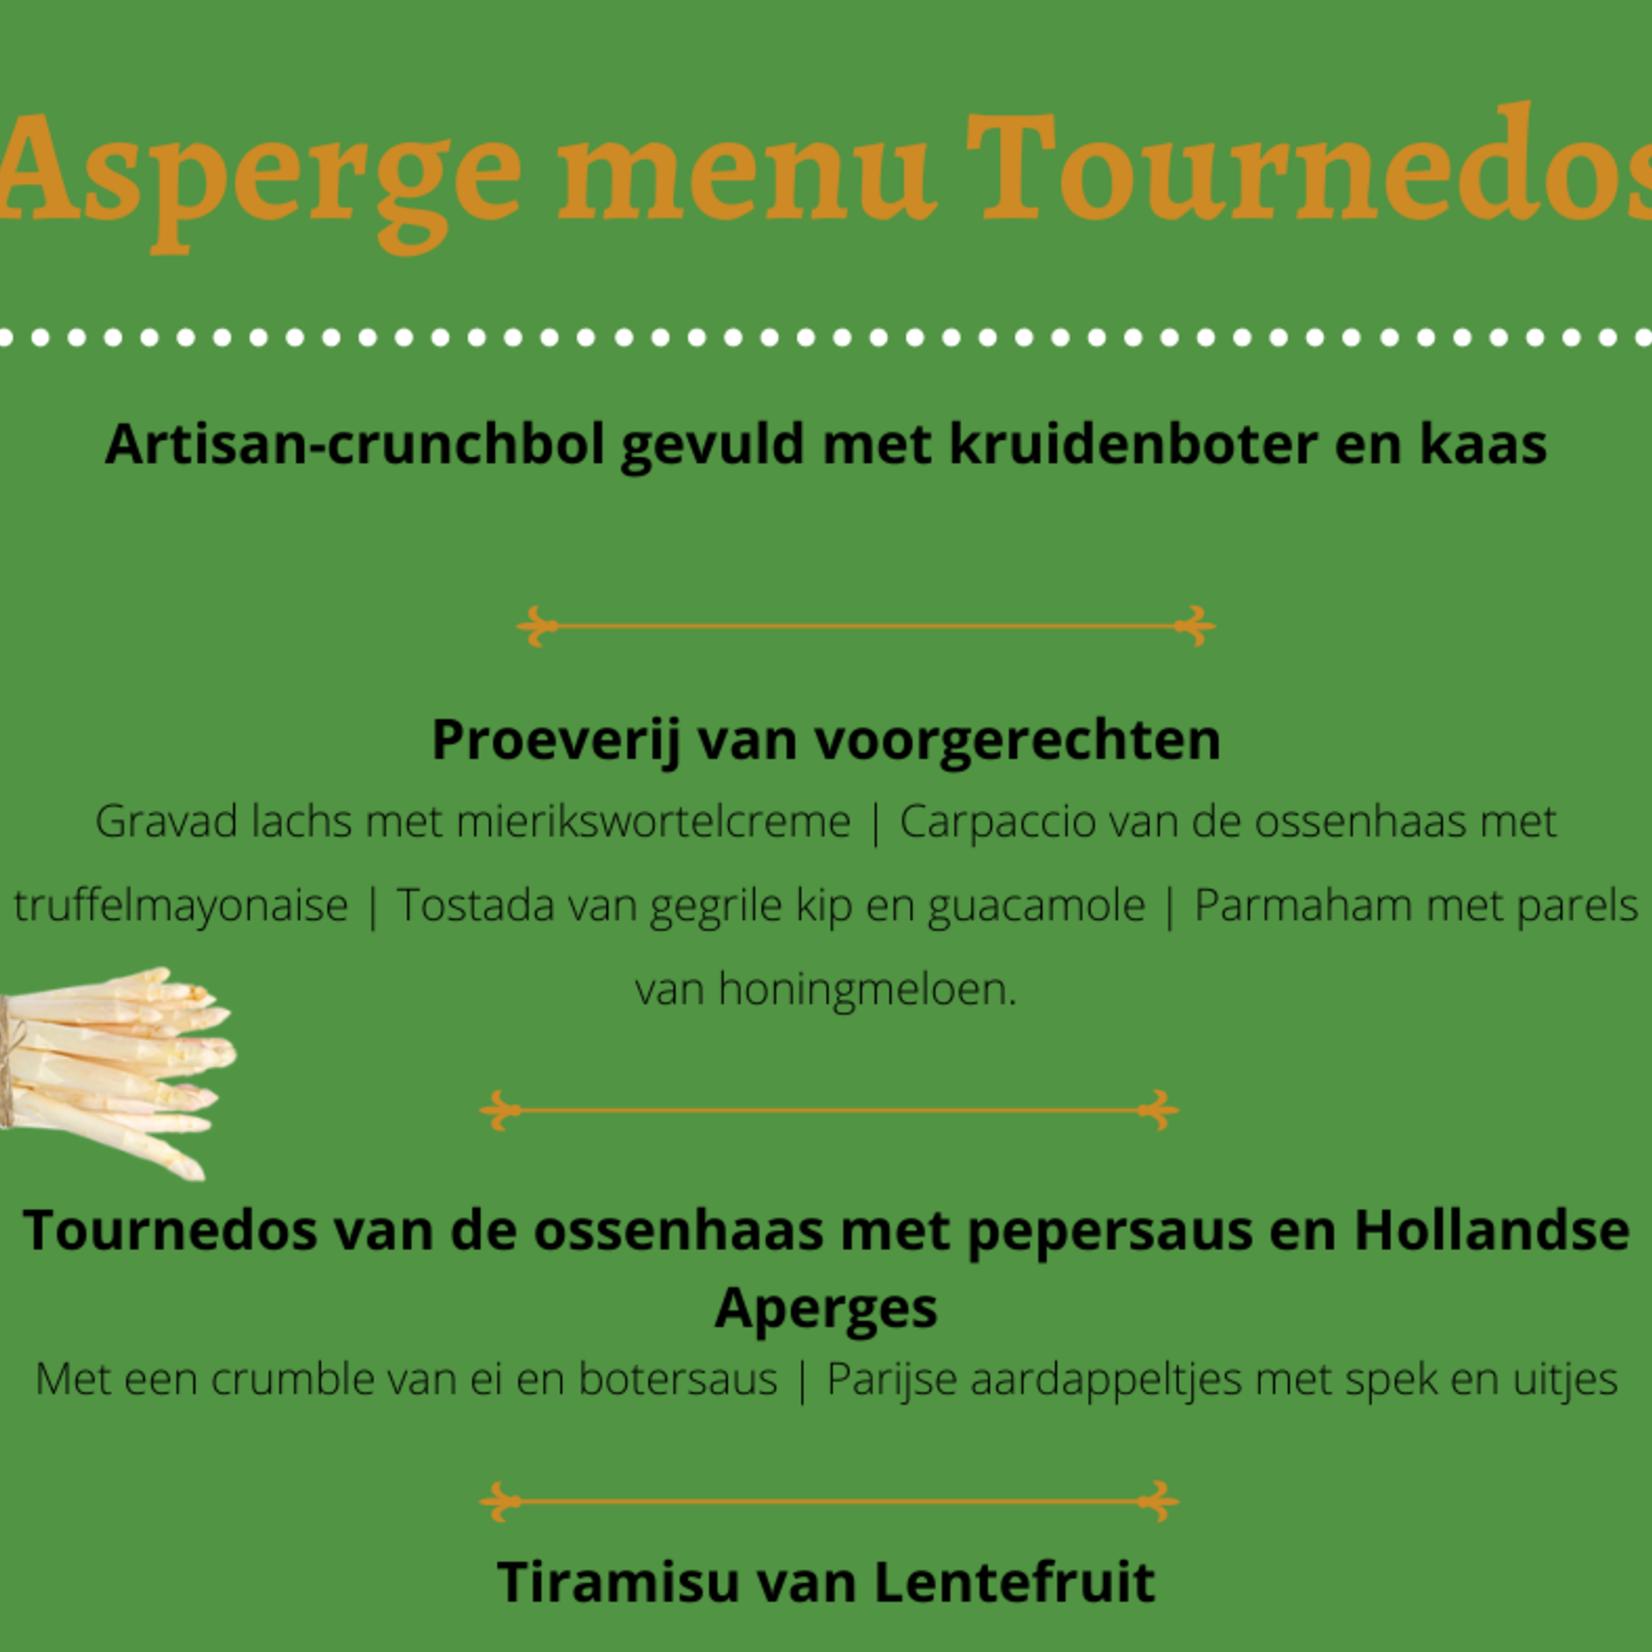 Asperge menu Tournedos | per persoon | Berentsen